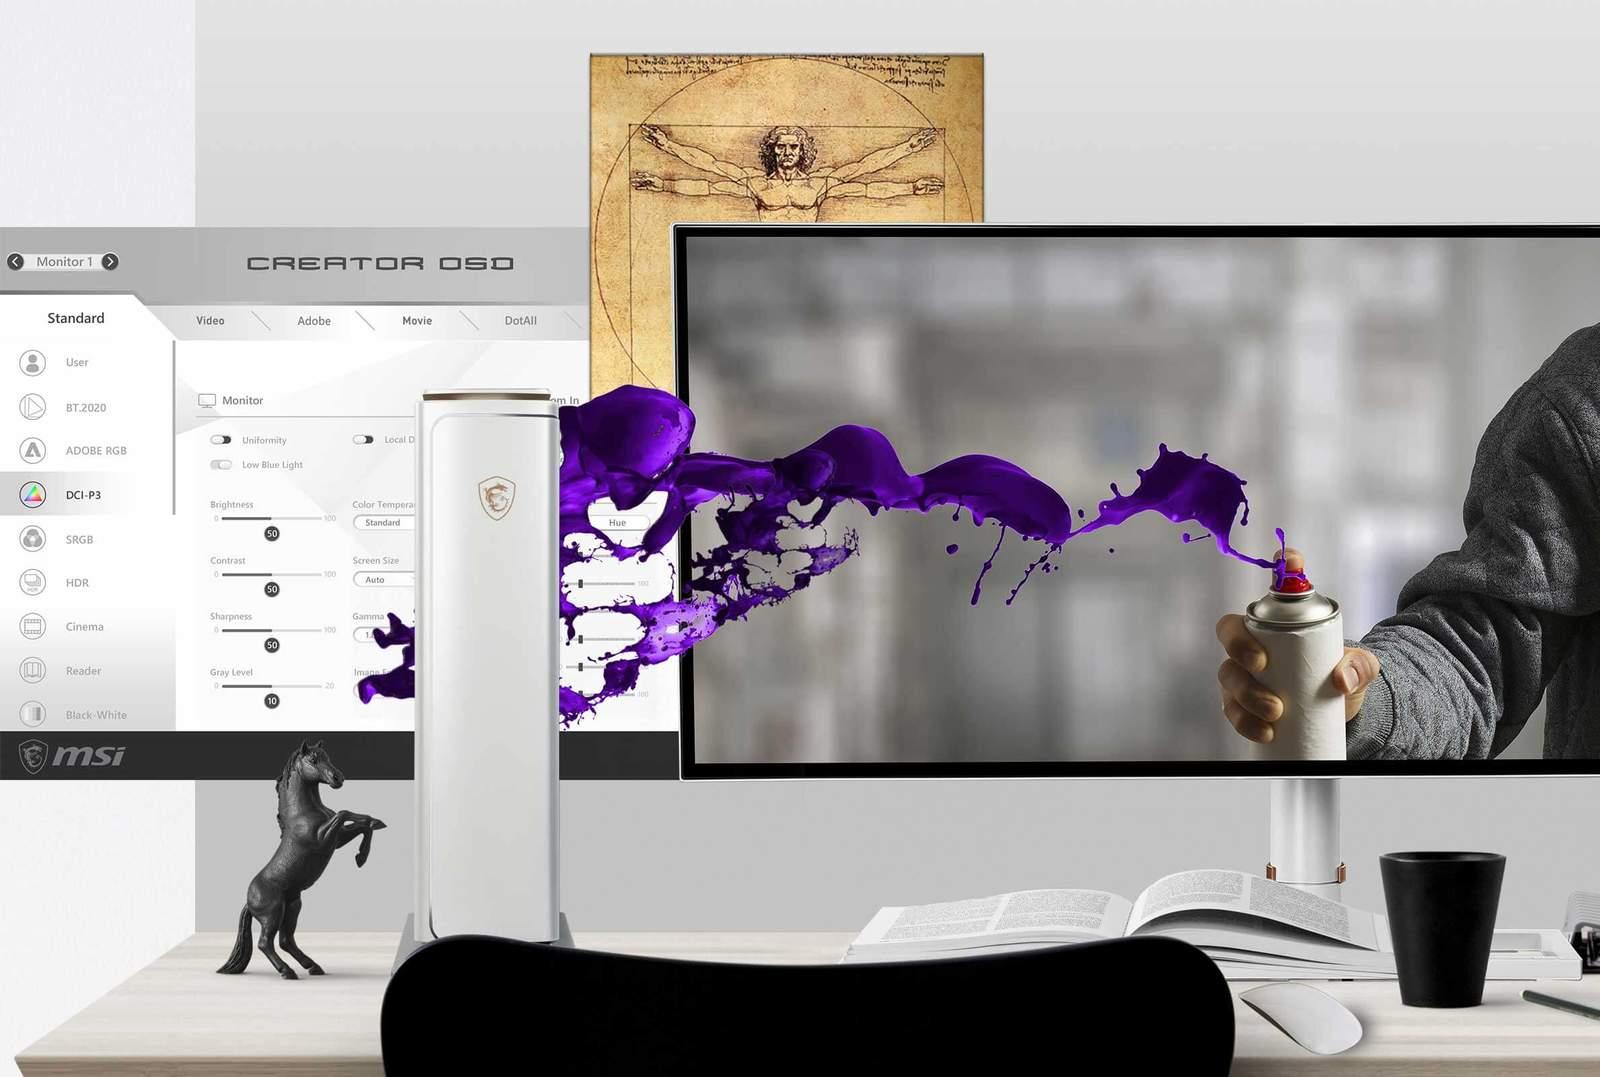 MSI Prestige P100 9th i9 64GB 2080 Ti 1TB 4TB Desktop image